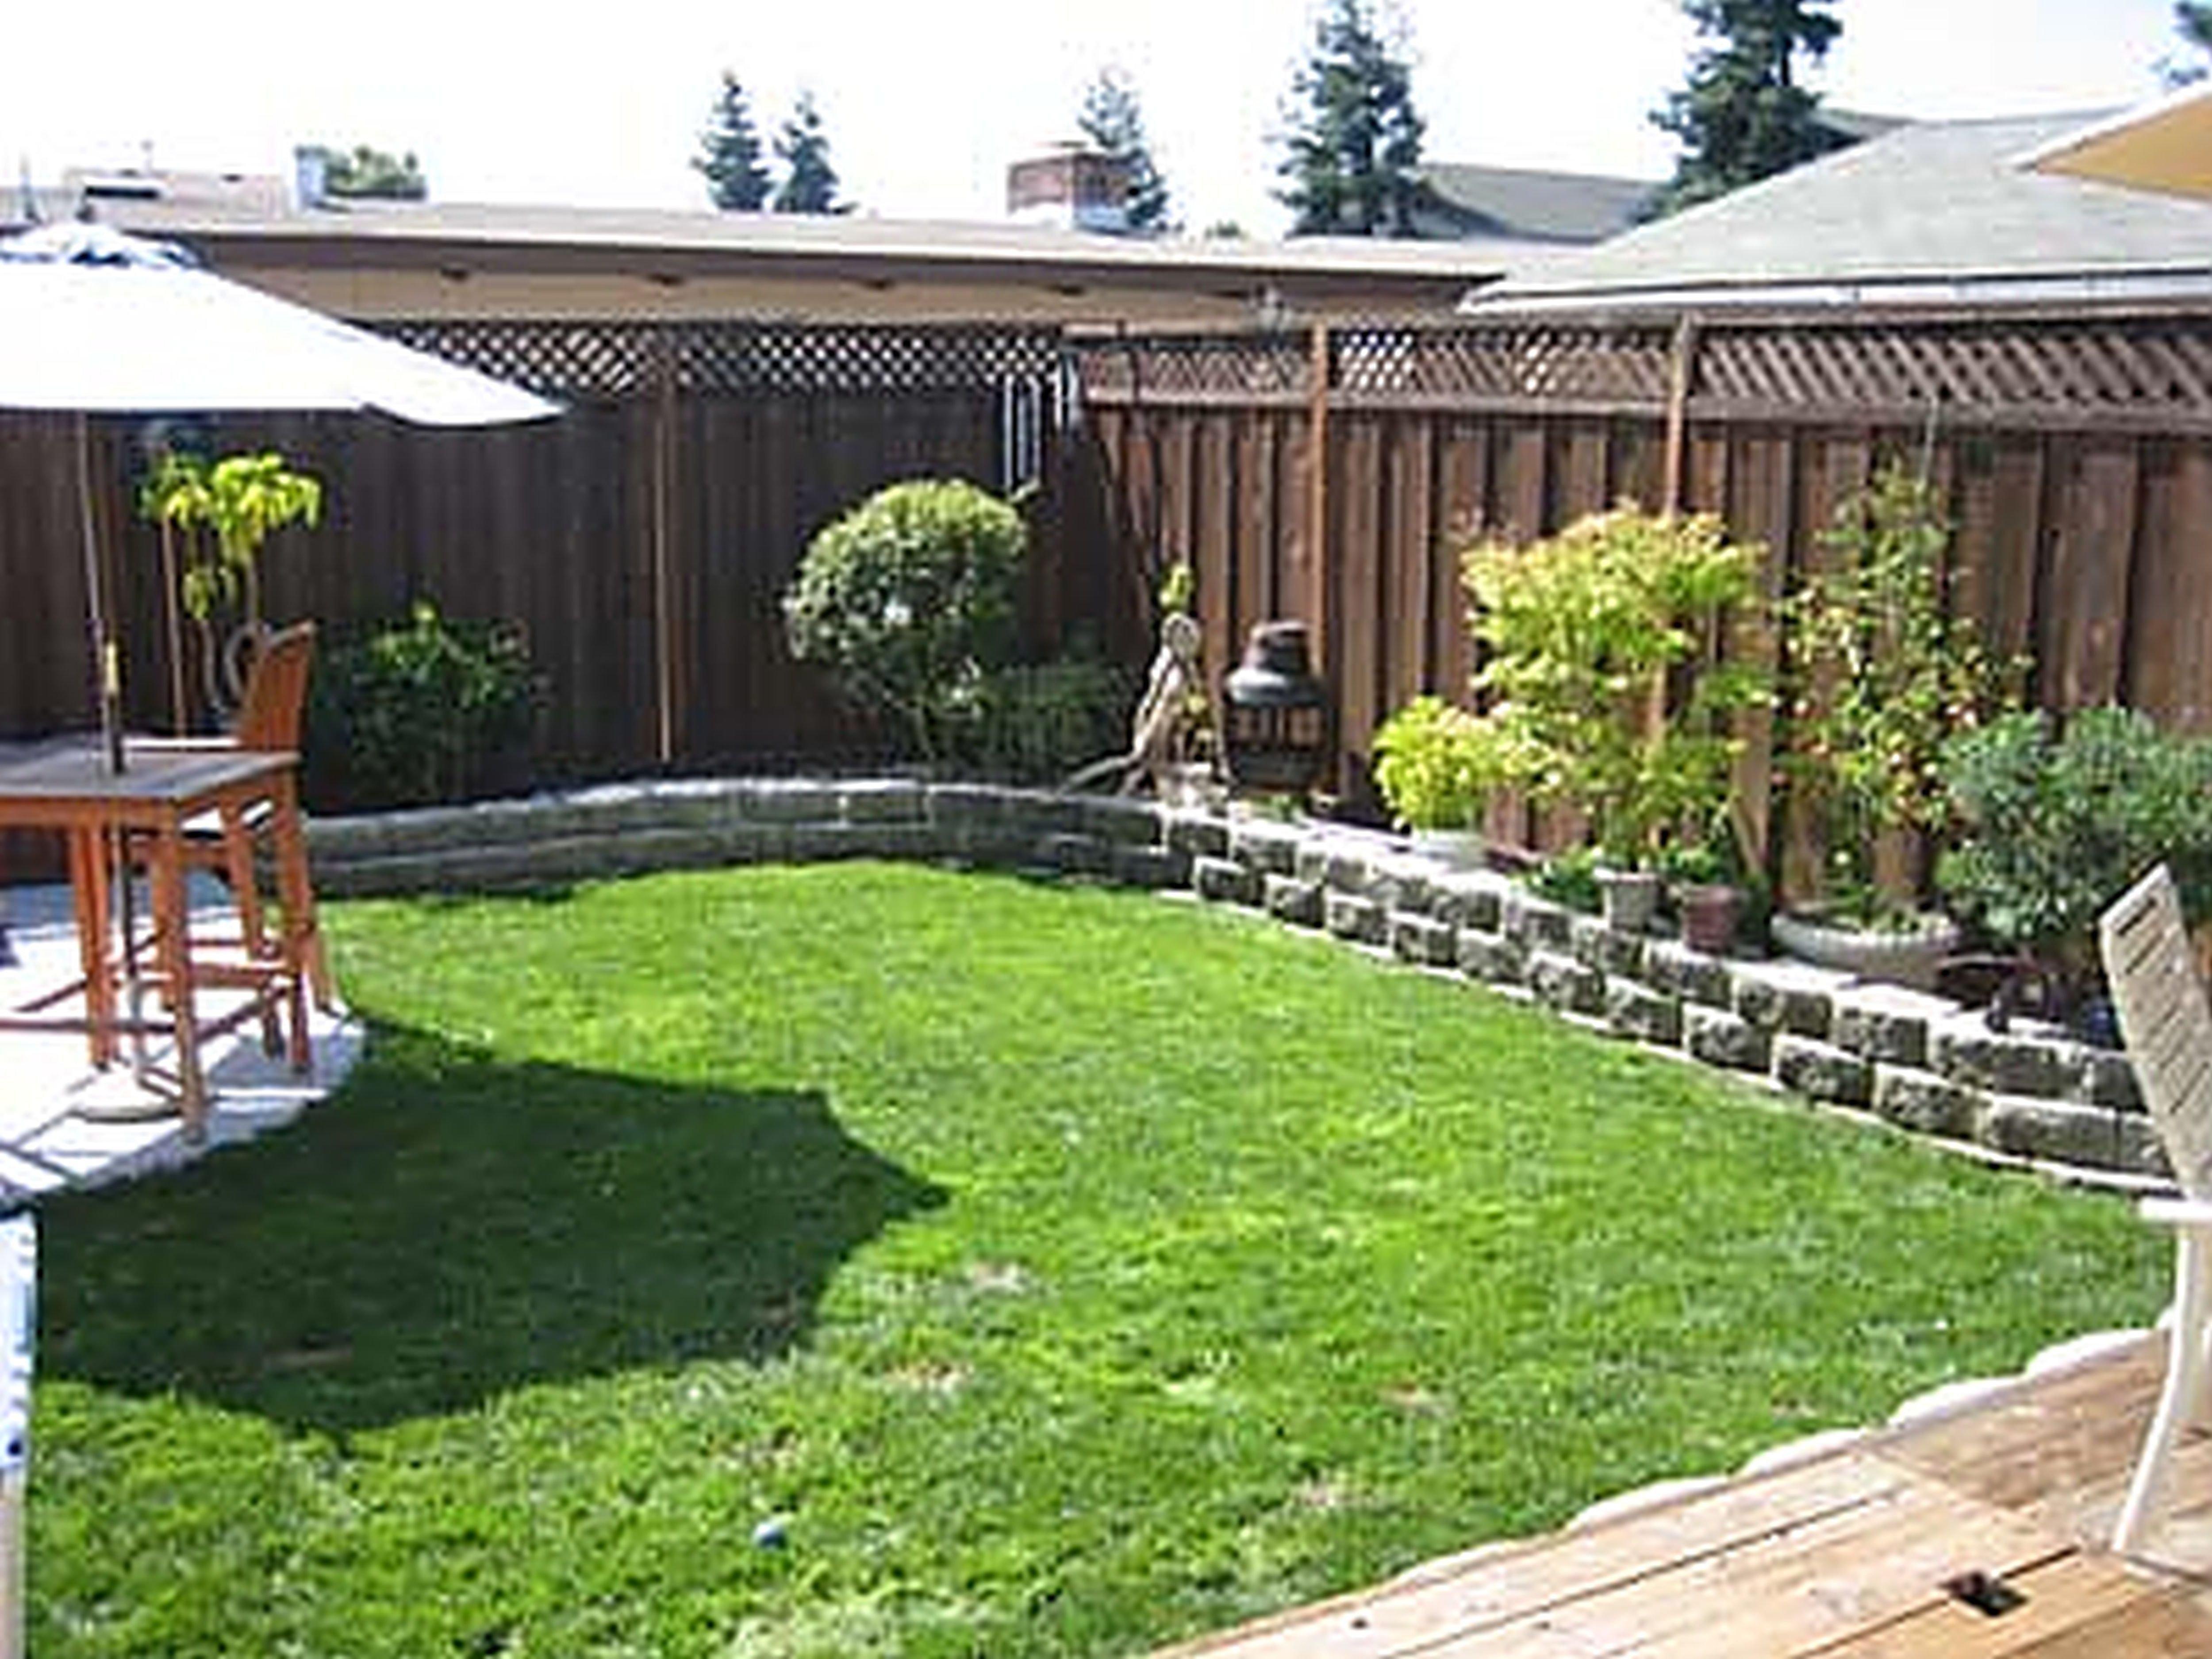 10 Cute Small Garden Ideas On A Budget yard landscaping ideas on a budget small backyard landscaping 2021